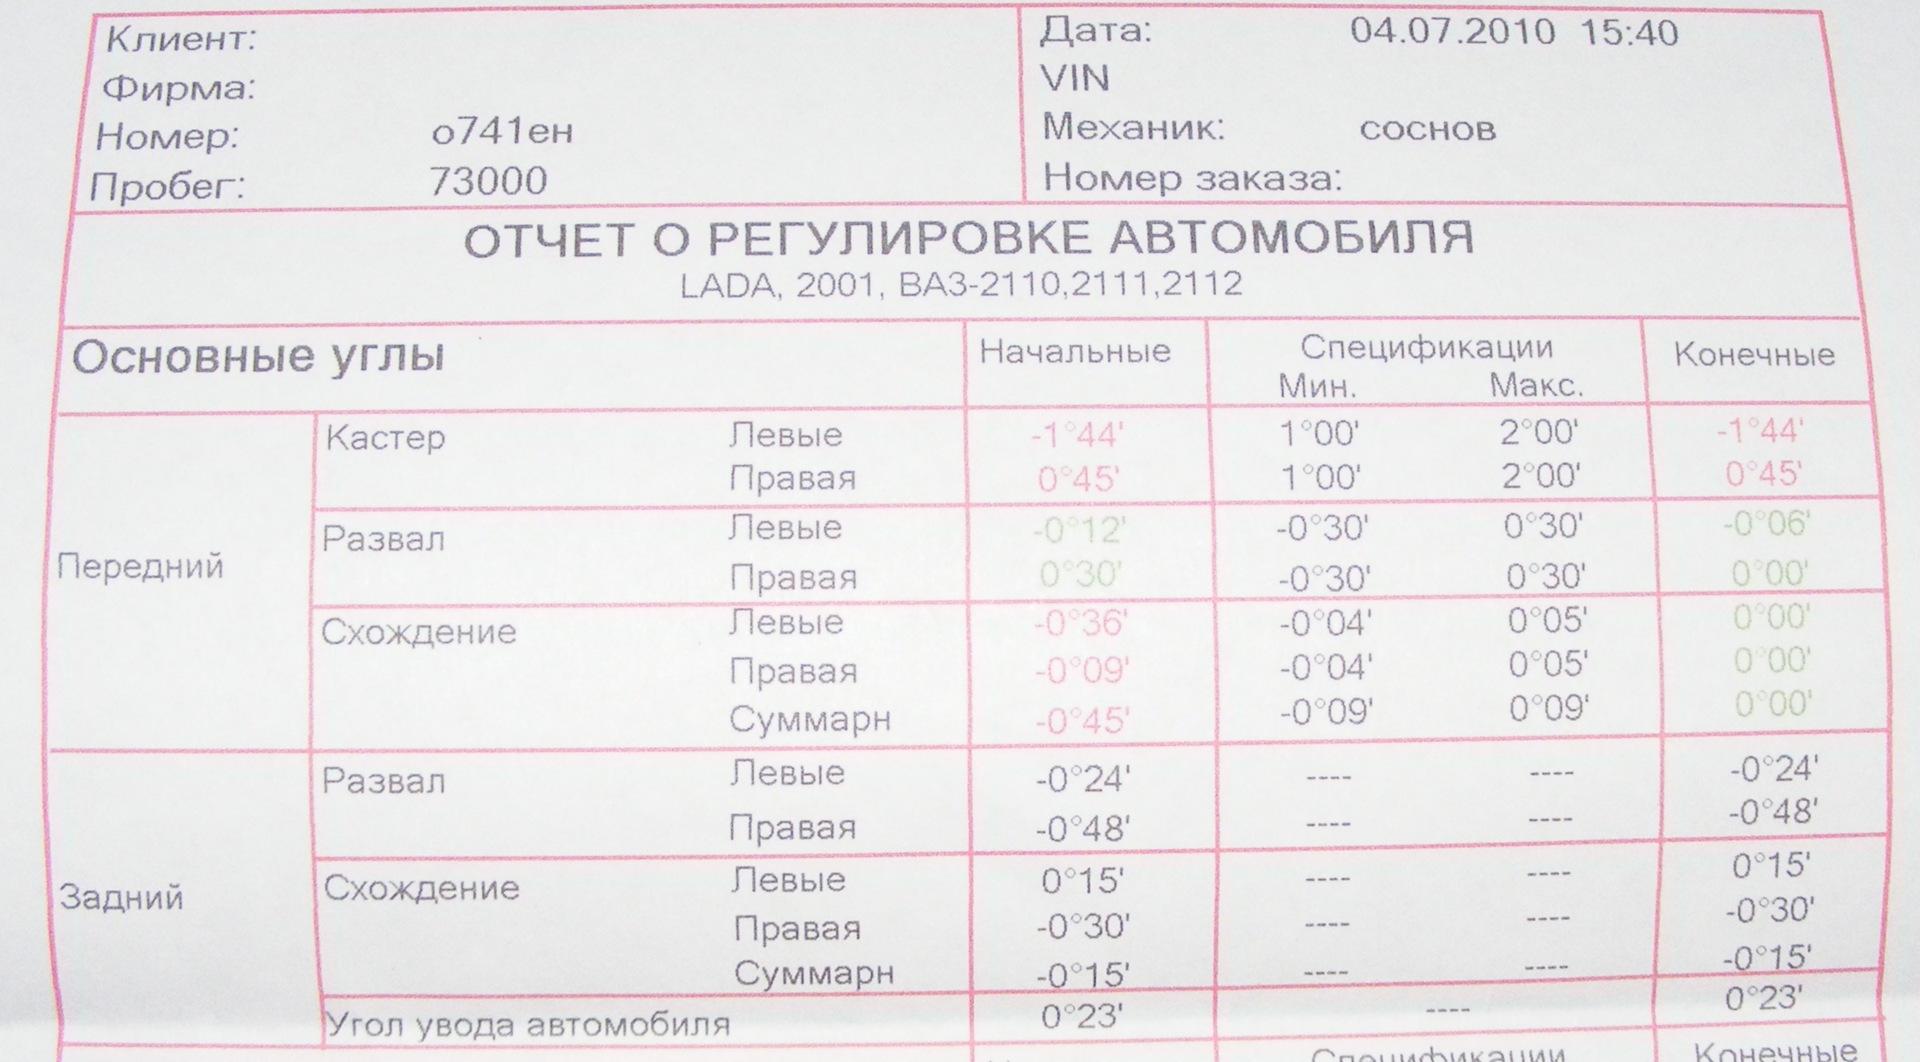 Фото №30 - сход развал ВАЗ 2110 параметры